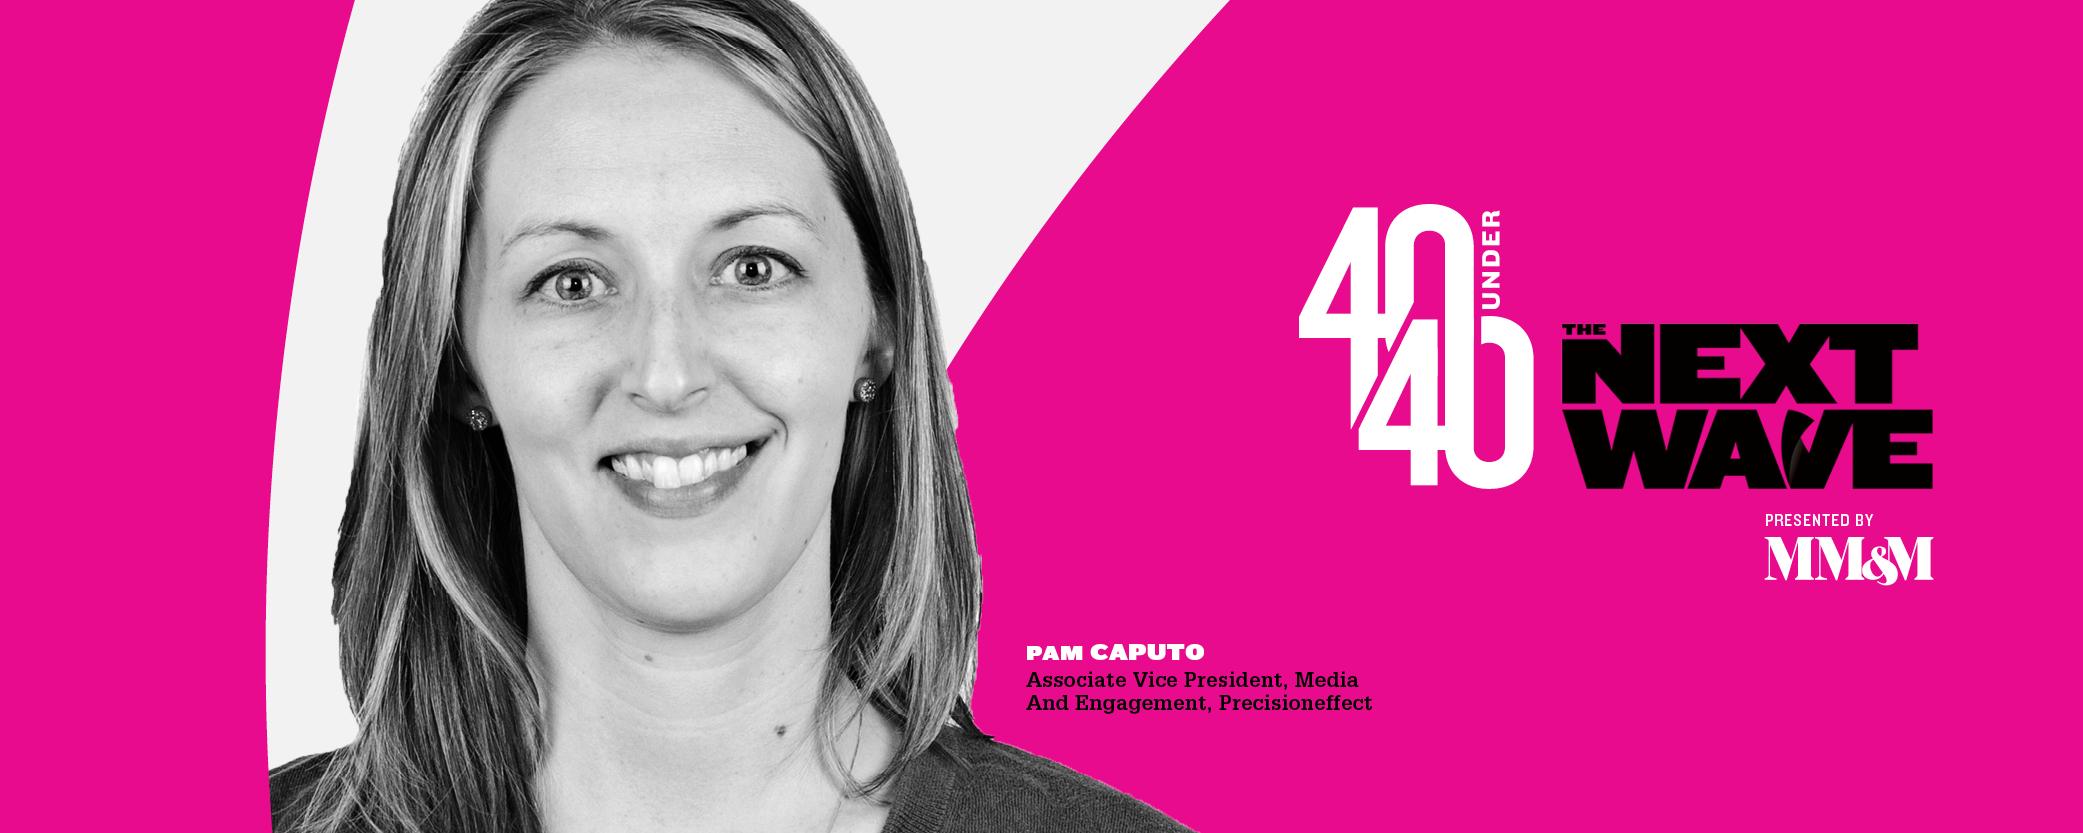 40 Under 40 2020: Pam Caputo, Precisioneffect